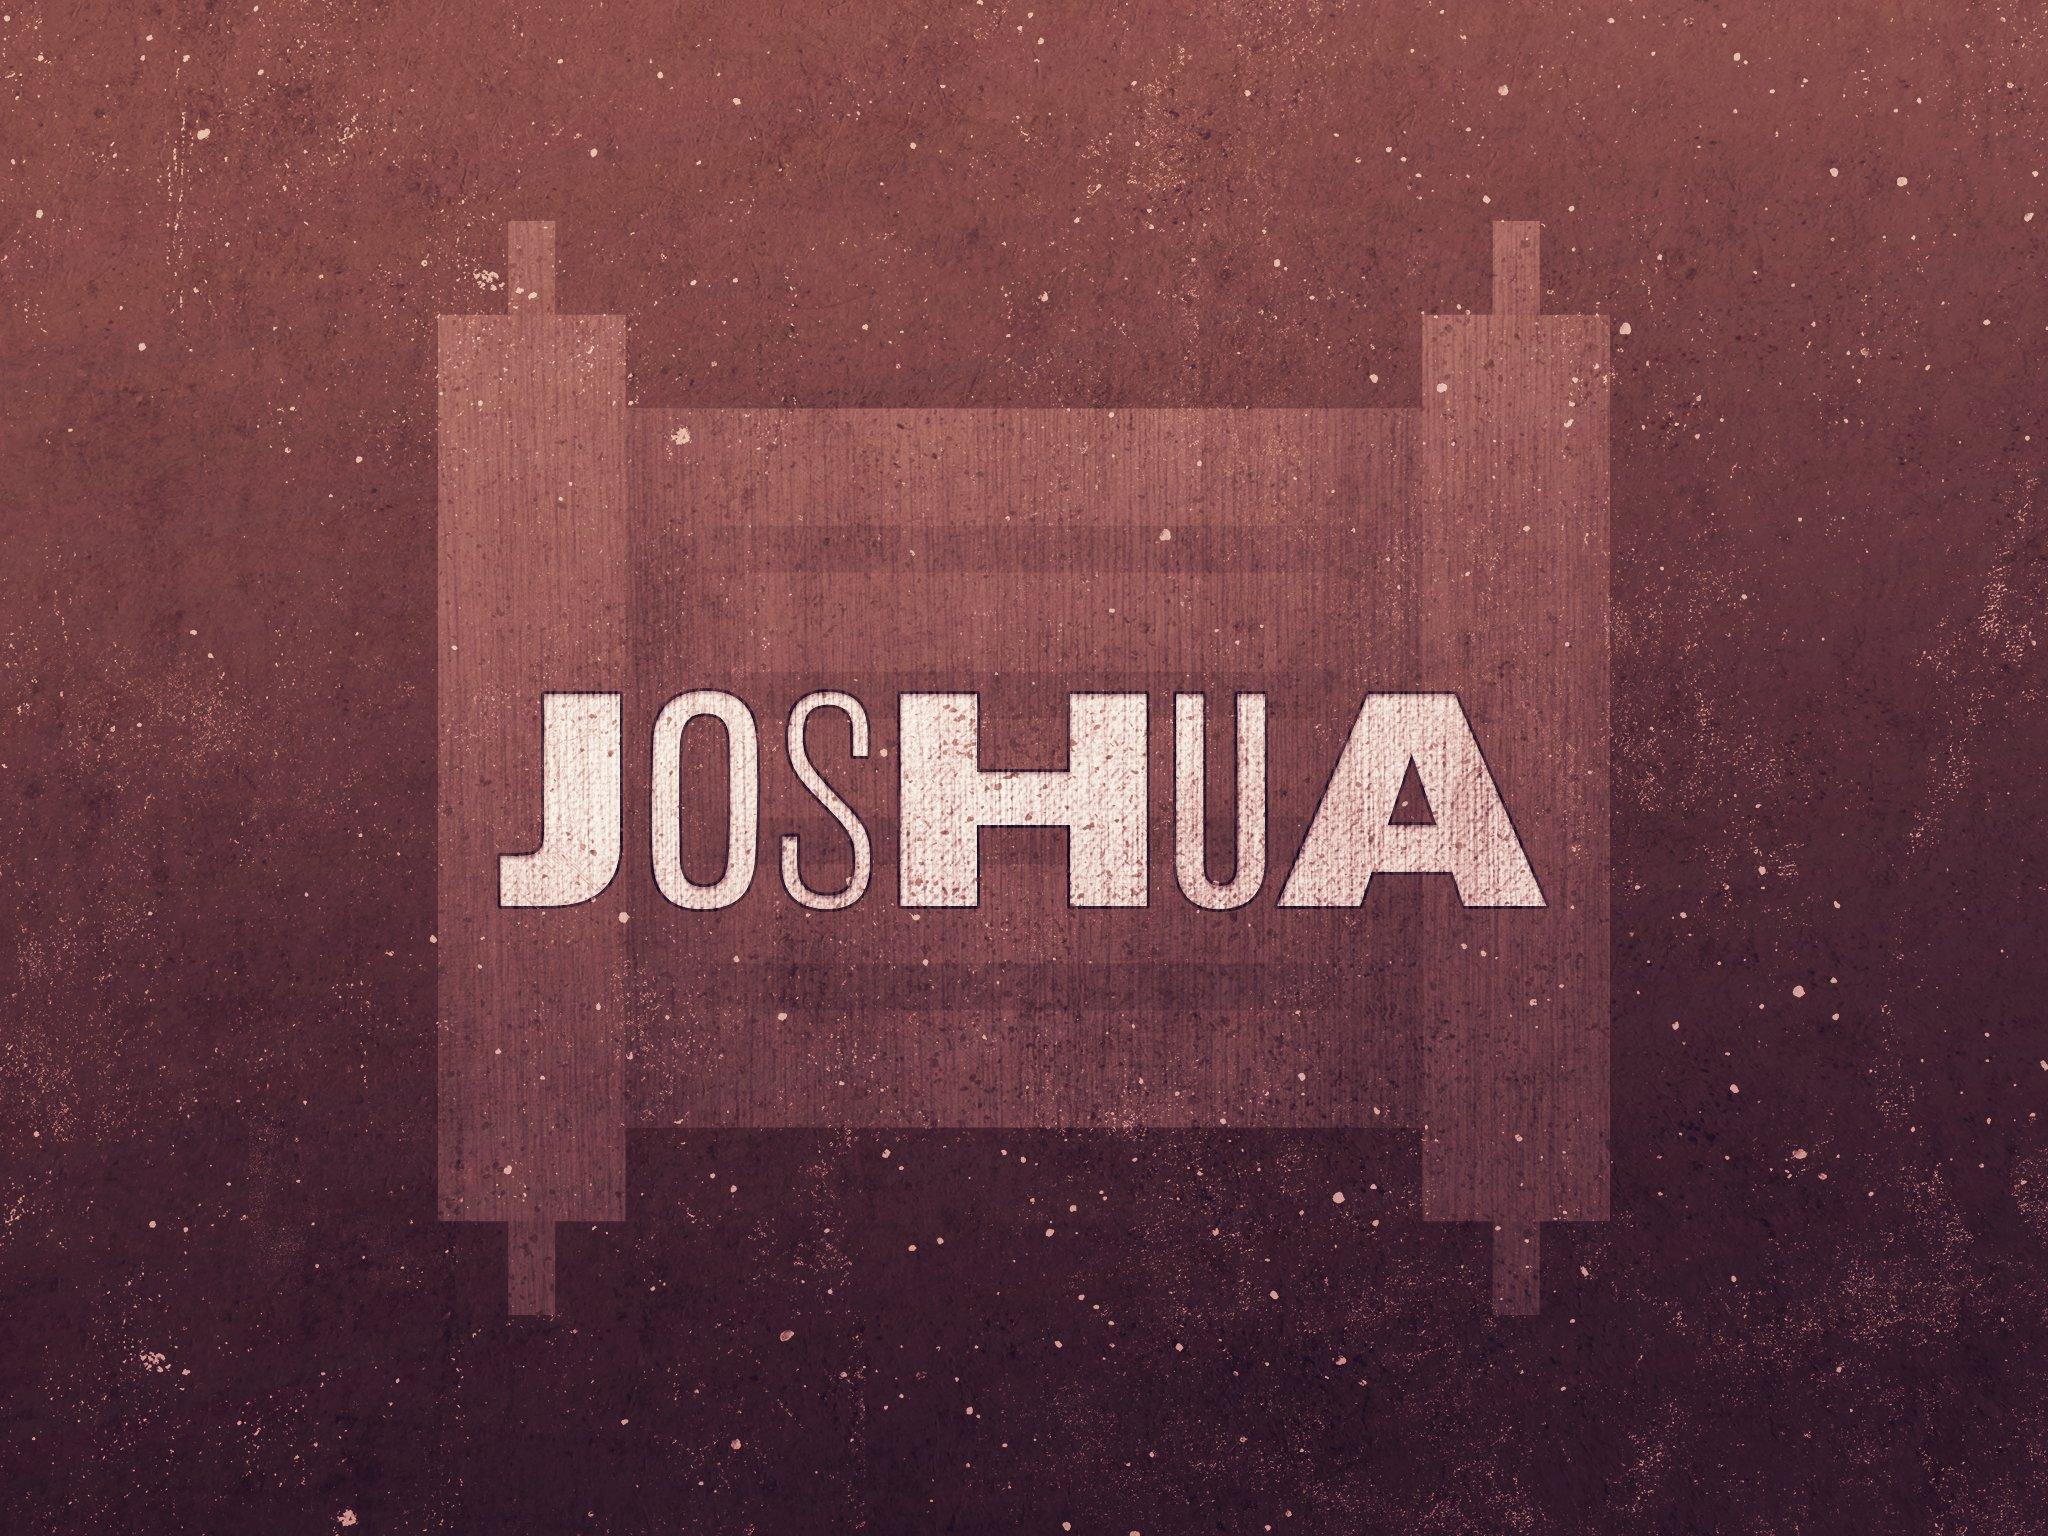 06-Joshua_Title_4x3-fullscreen.jpg